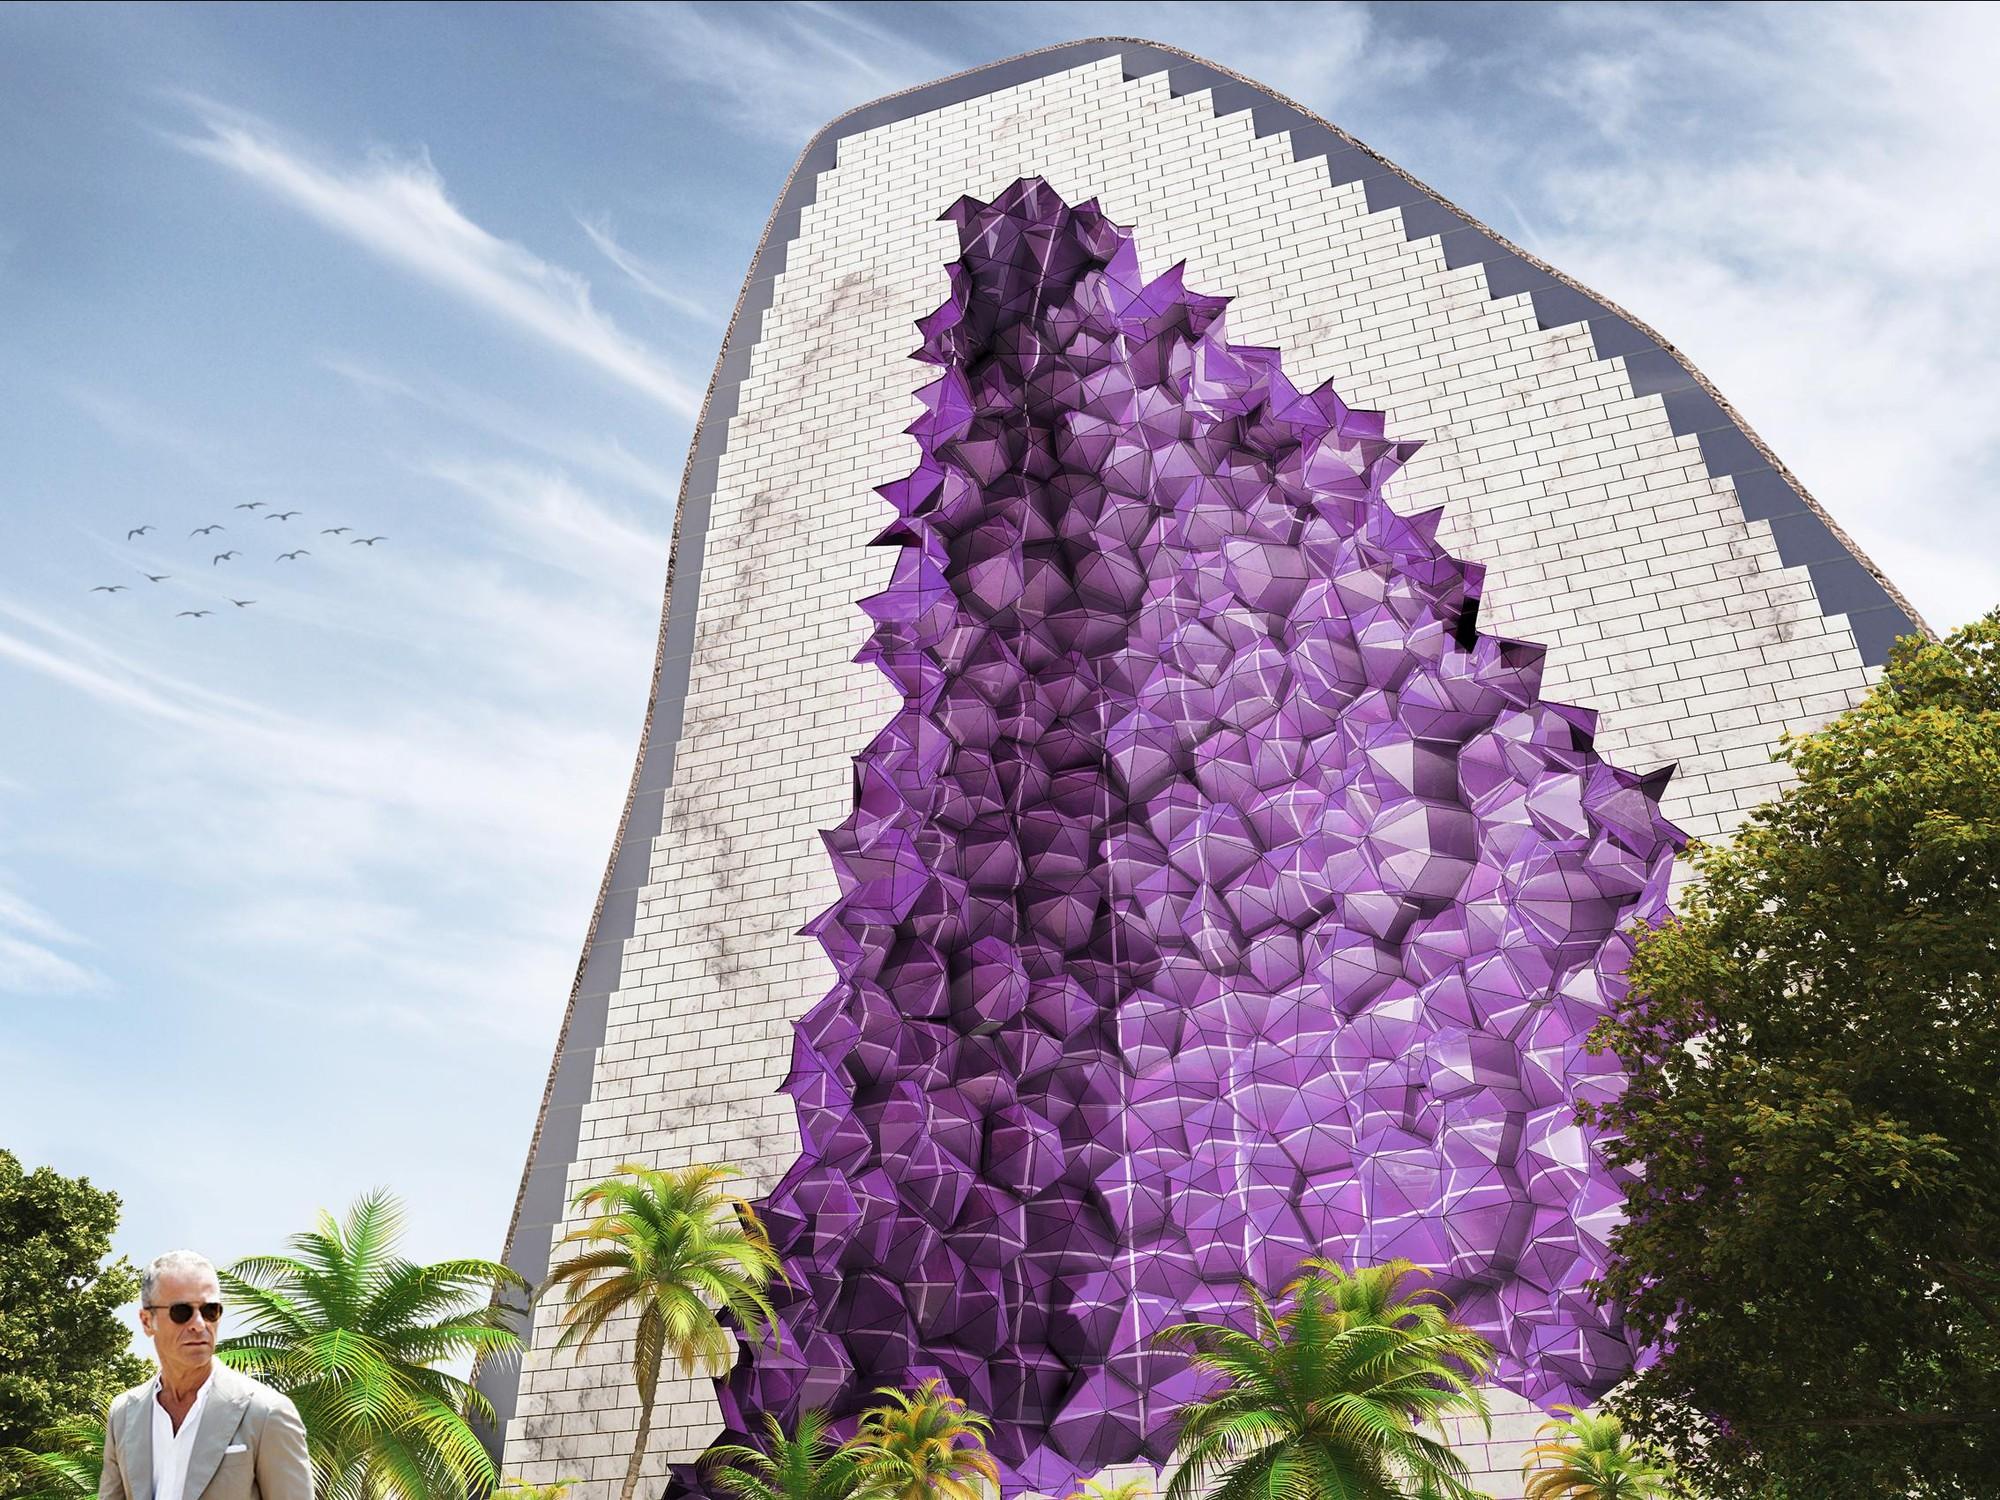 NL Architects propõe hotel inspirado em rocha ametista, Vista da base da torre. Imagem © NL Architects